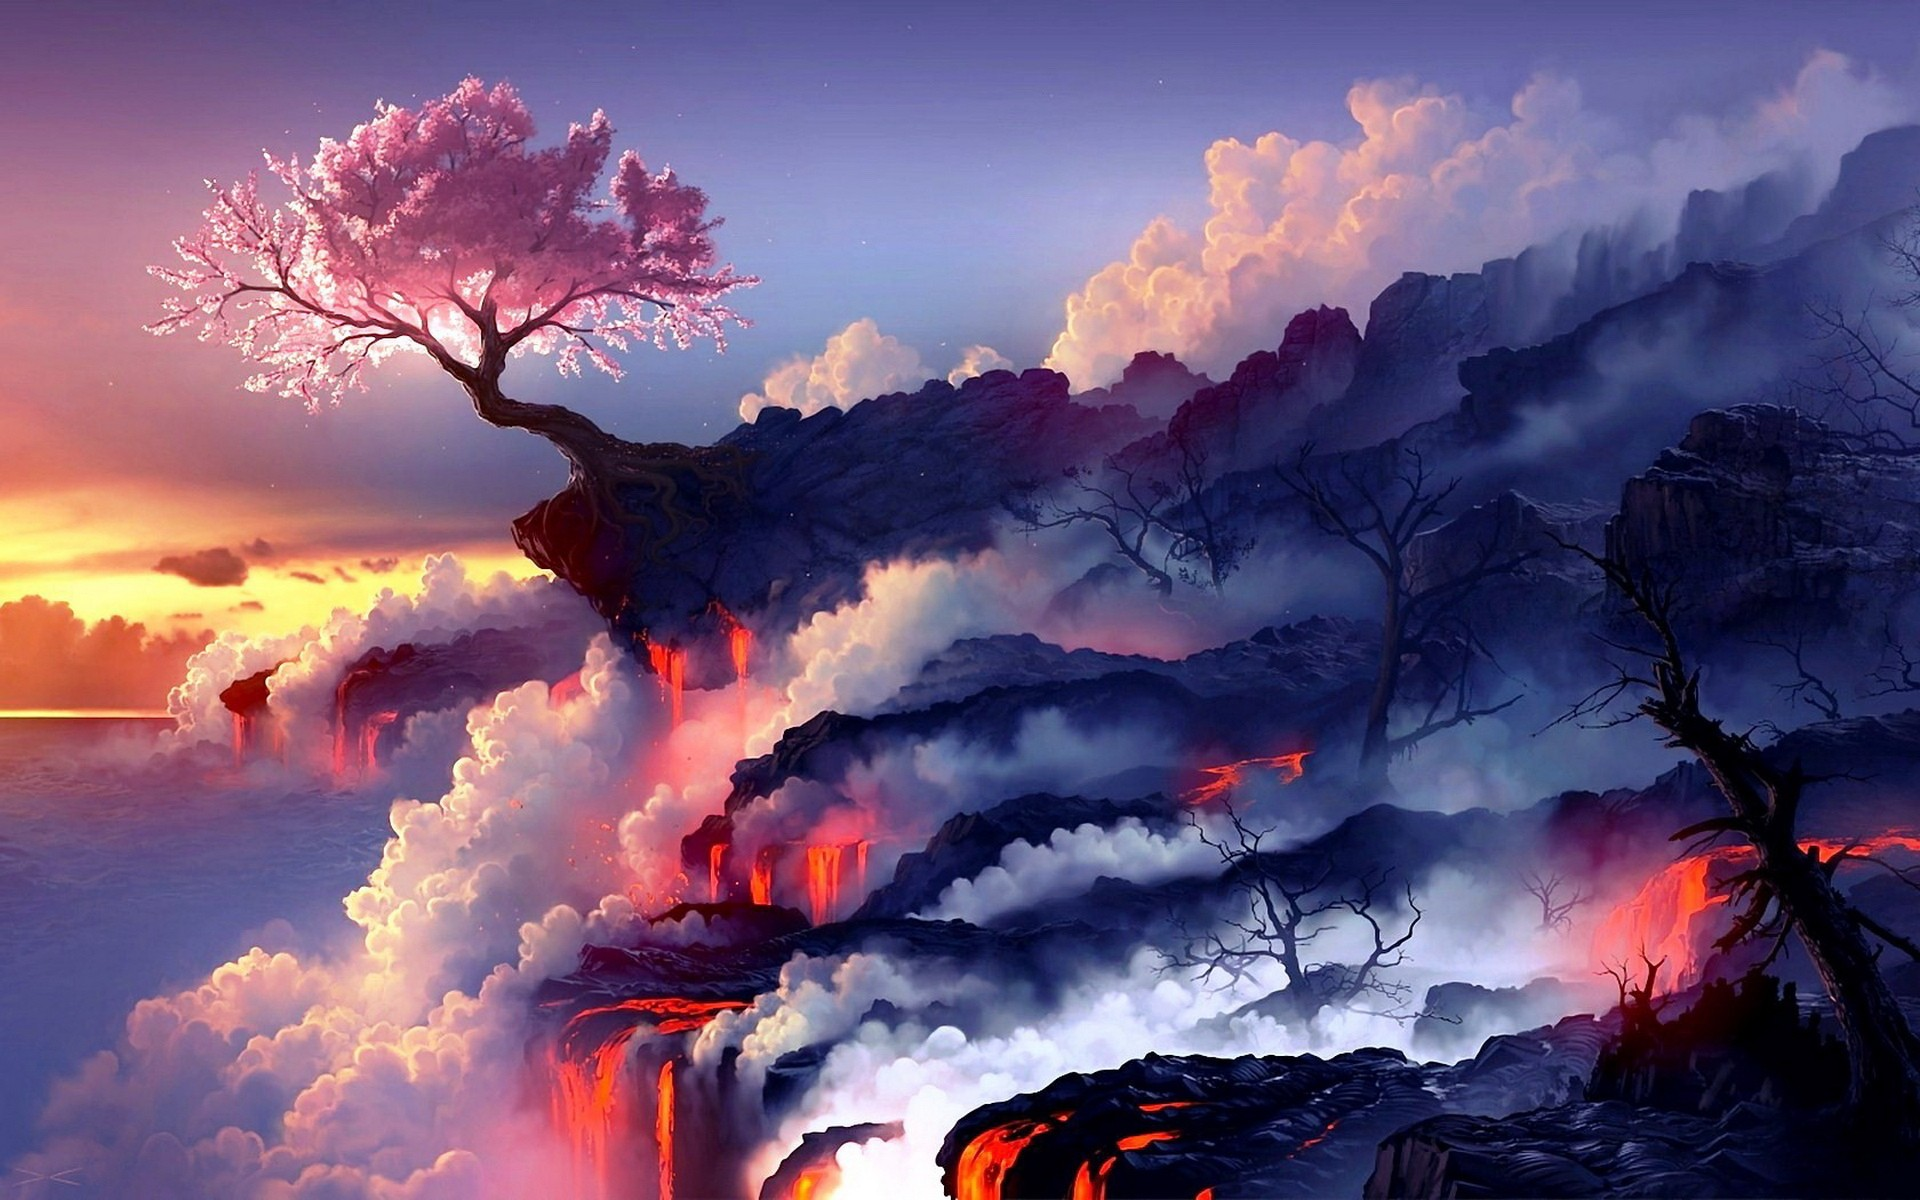 Cherry blossoms and lava wallpaper4mecom 1920x1200